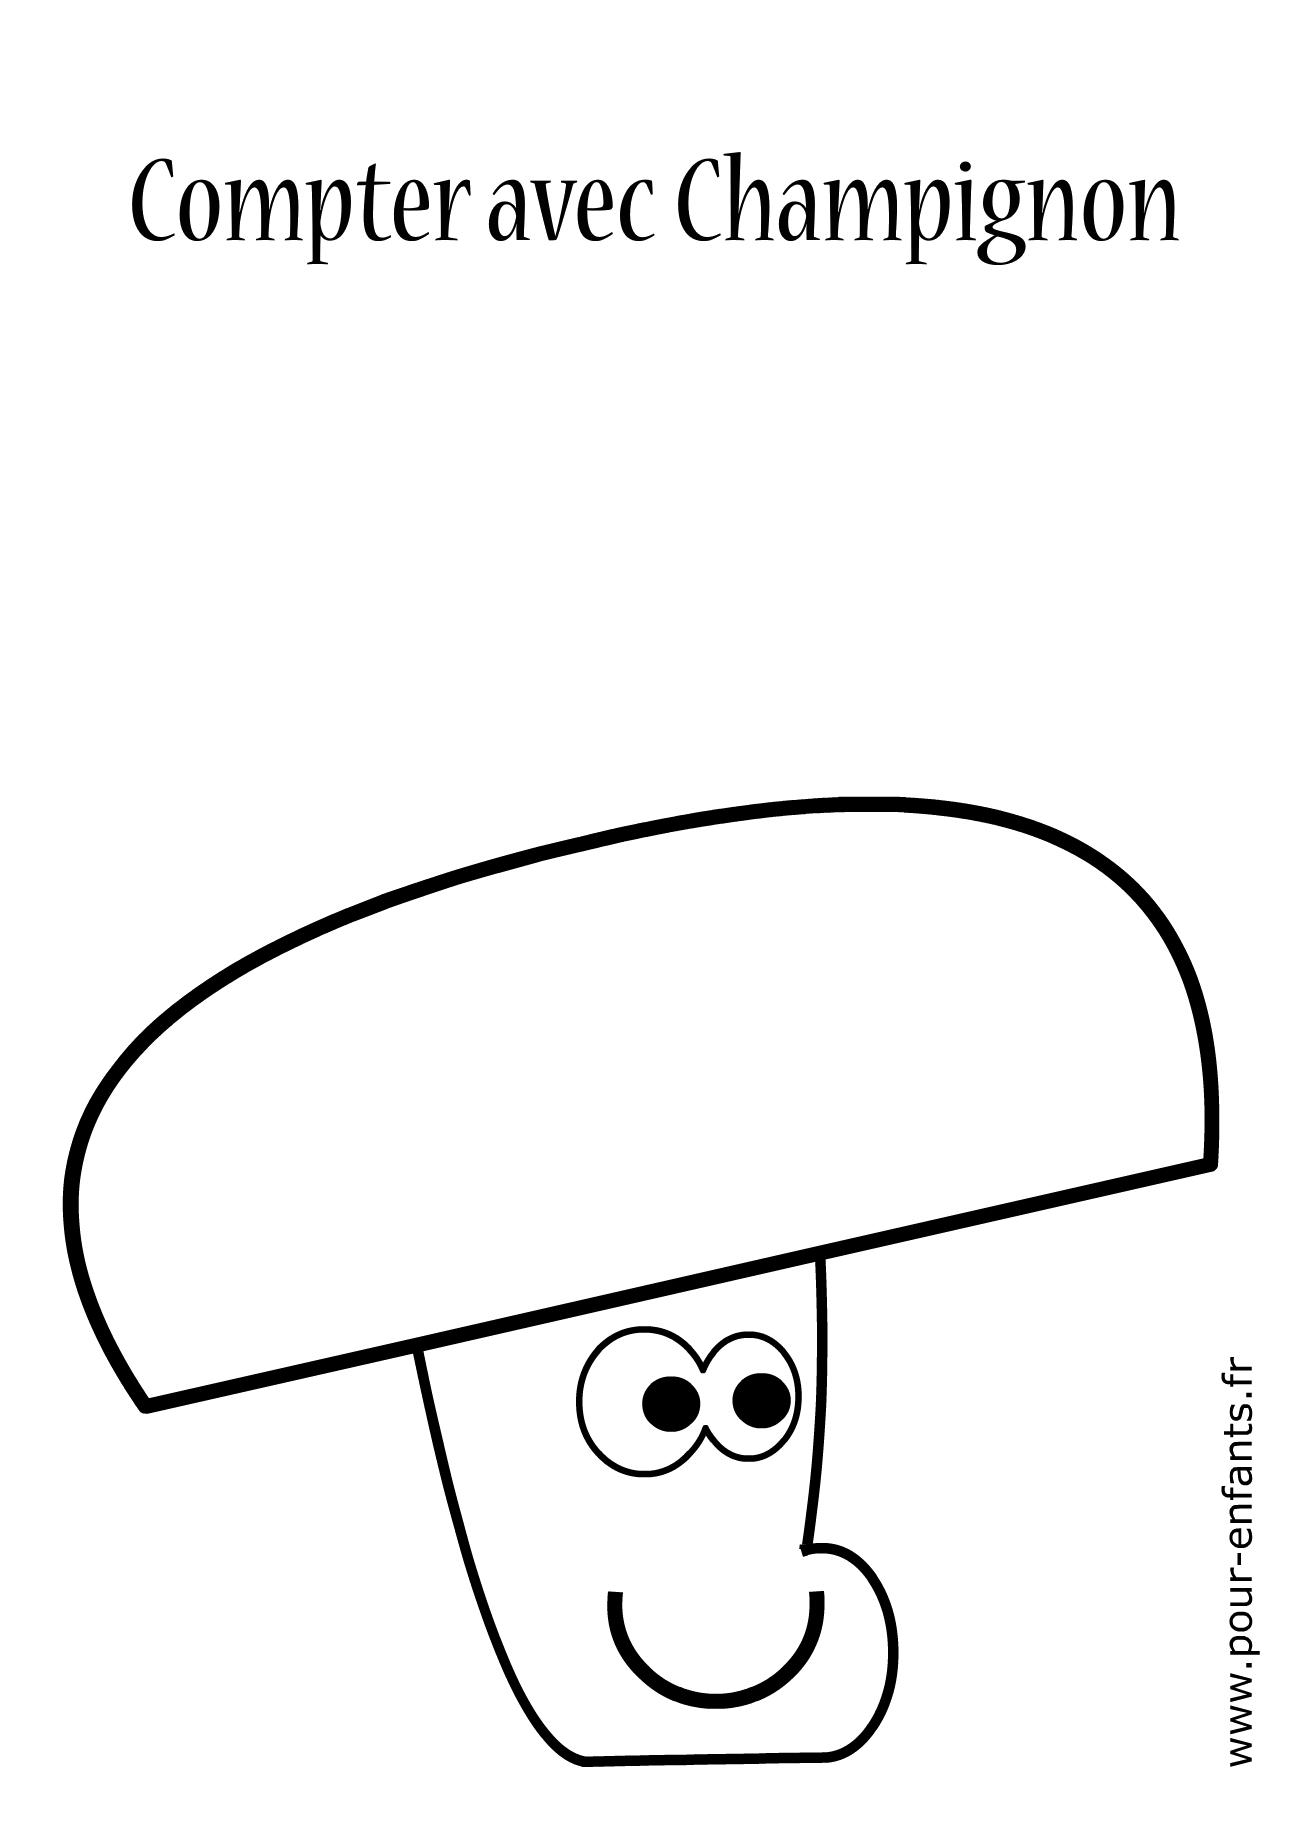 Jeux imprimer maternelle apprendre compter livre - Dessin de champignons a imprimer ...